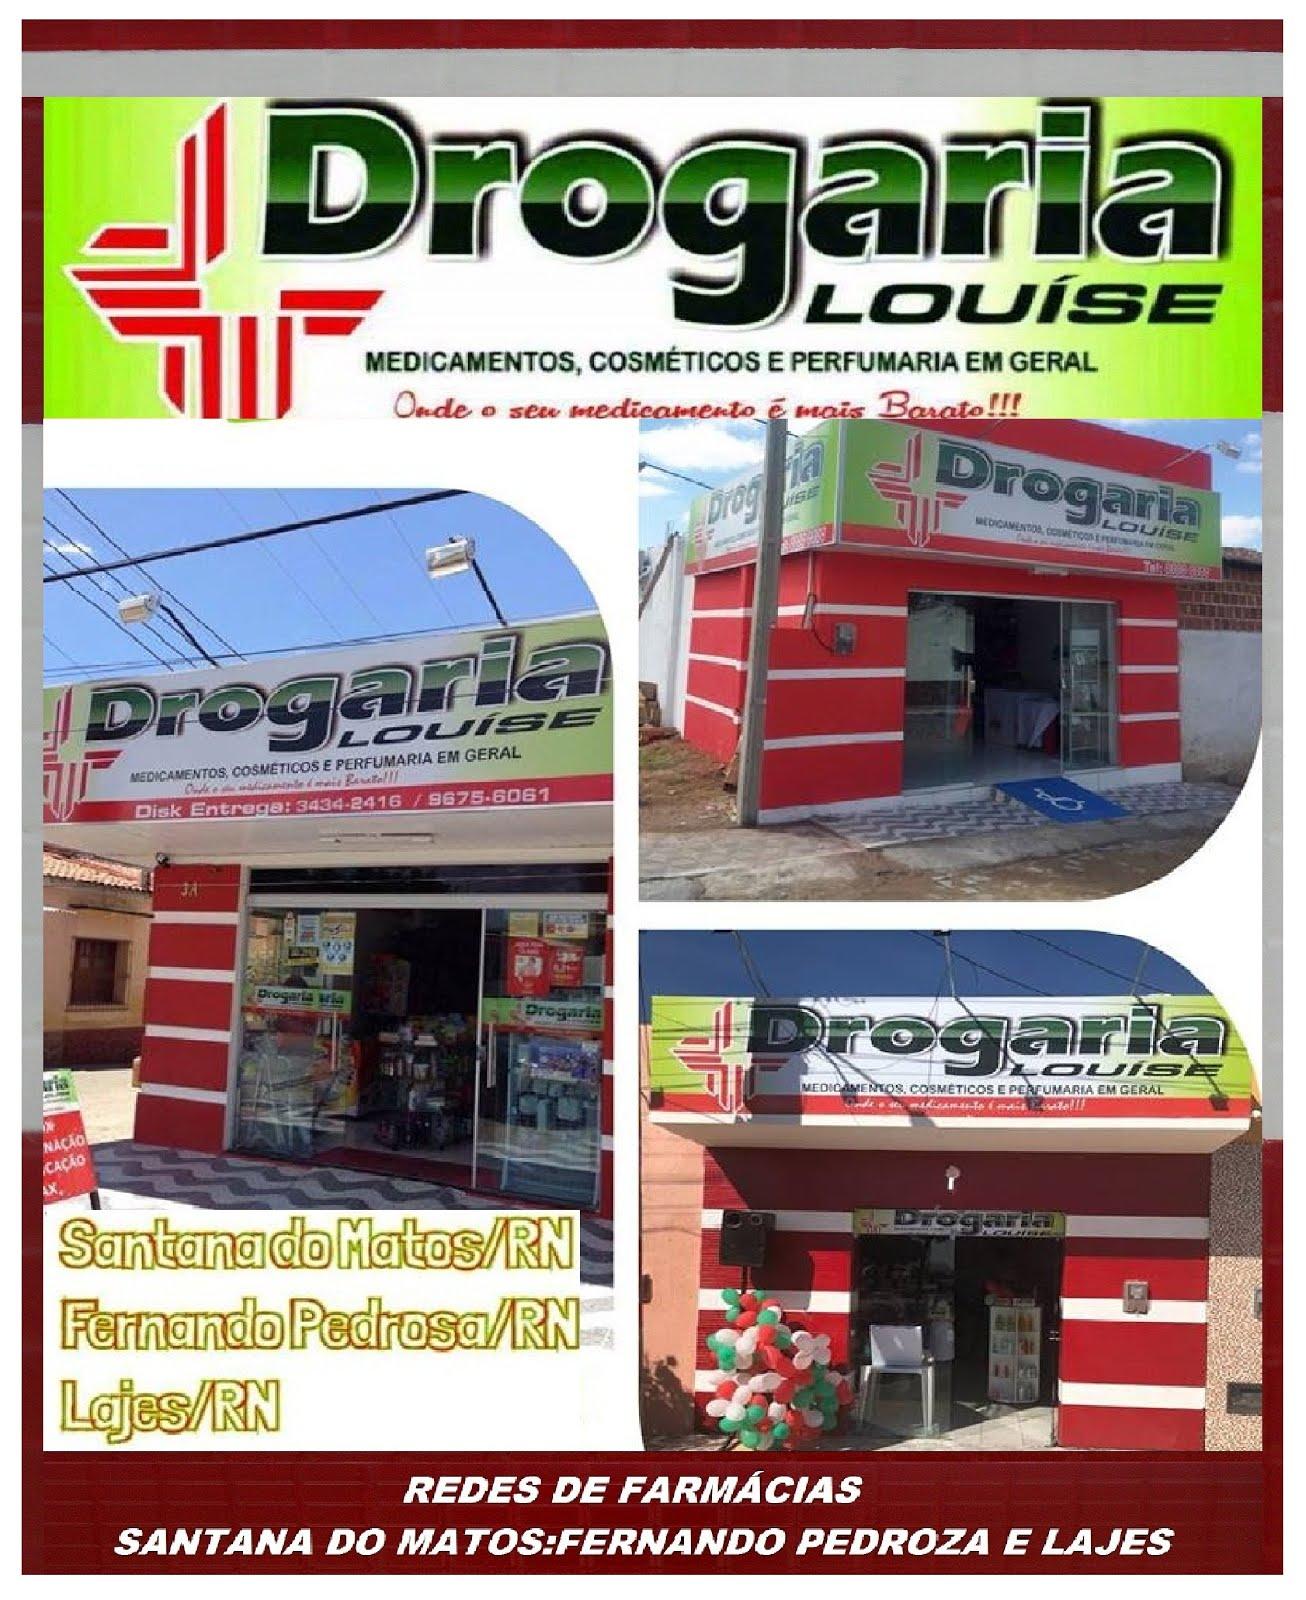 FARMÁCIAS DROGARIAS LOUISE